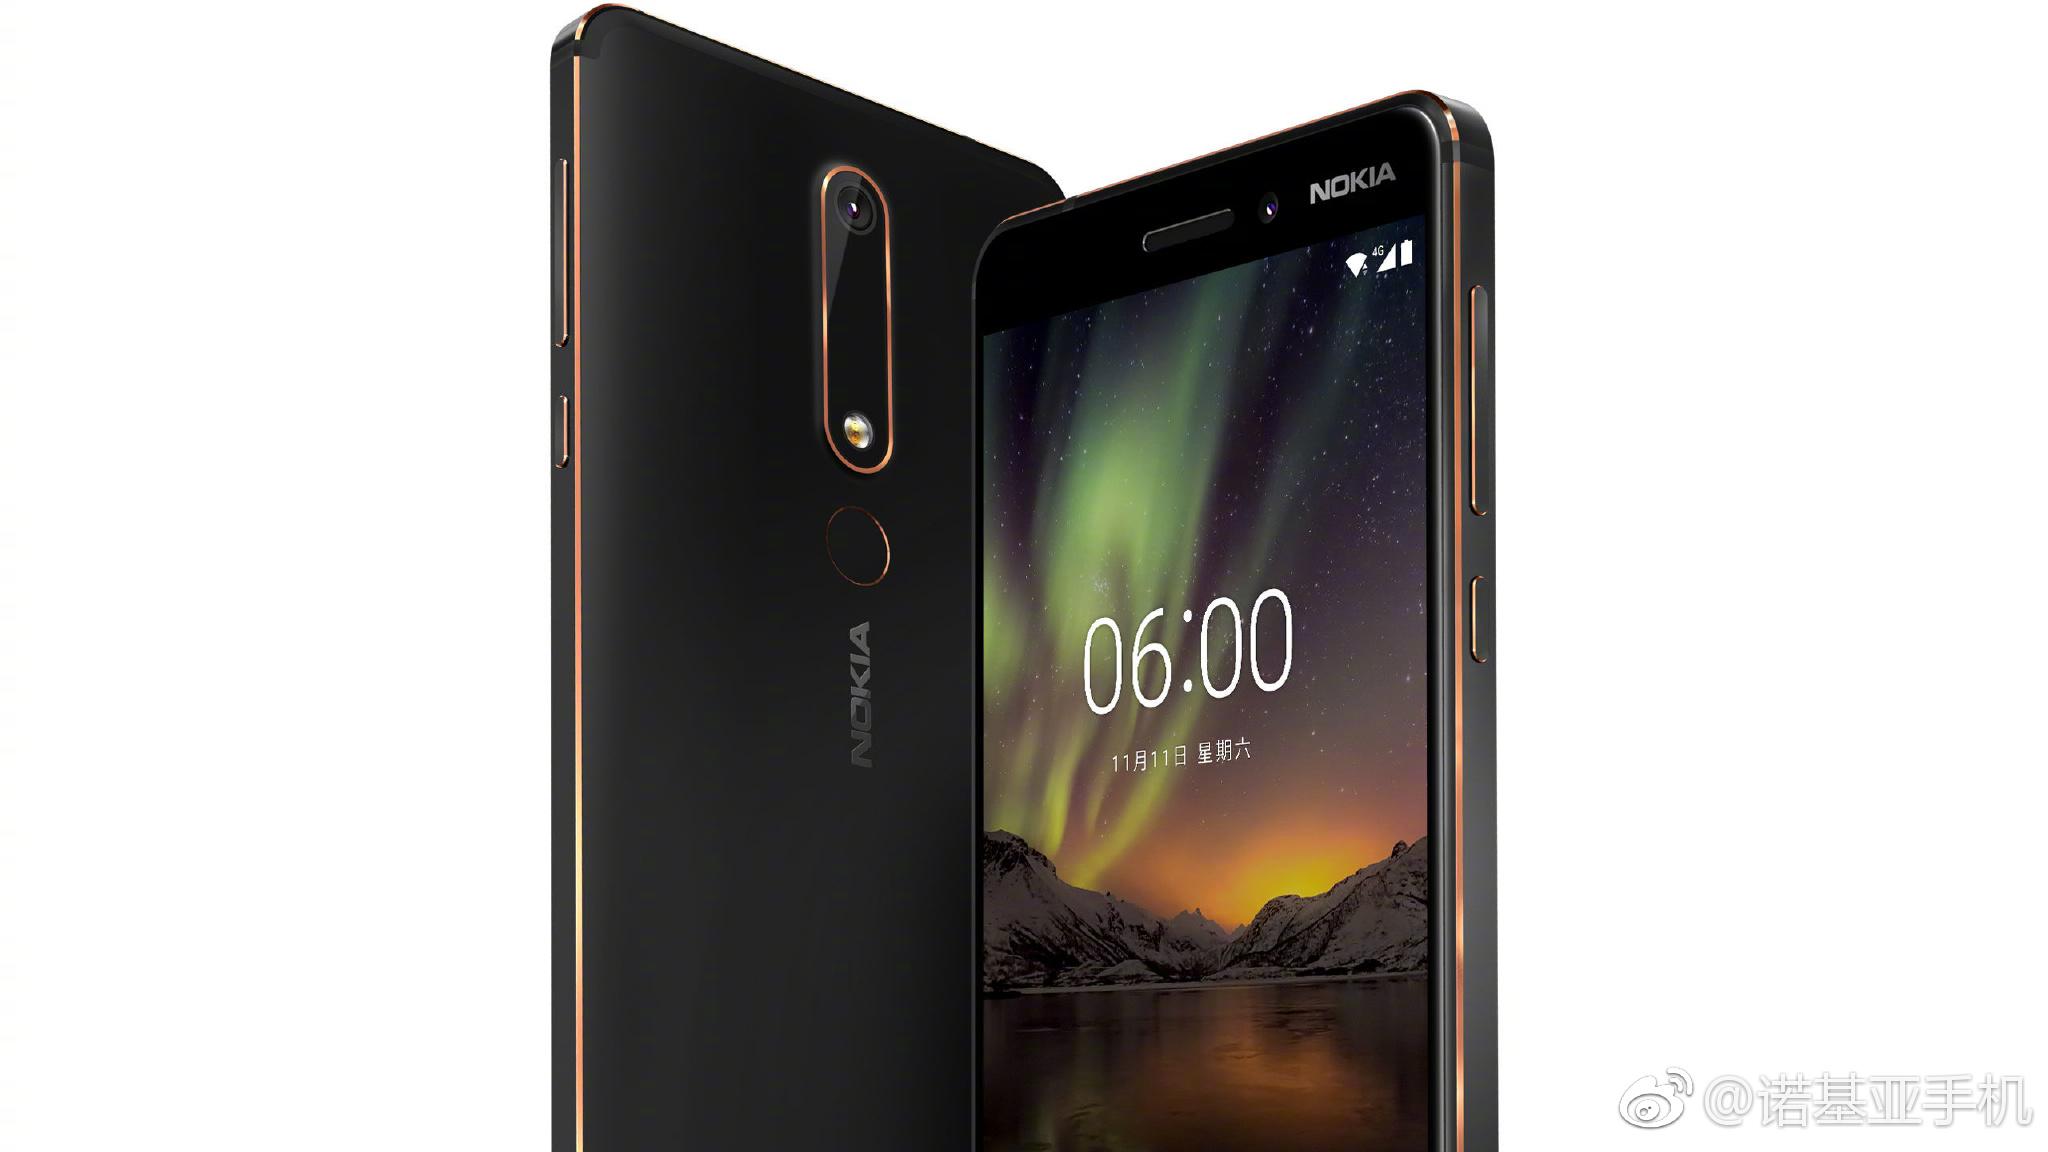 HMD Global lanza la actualización de Android 8.0 Oreo para Nokia 7 y Nokia 6 (2018) - GizChina.es | GizChina.es